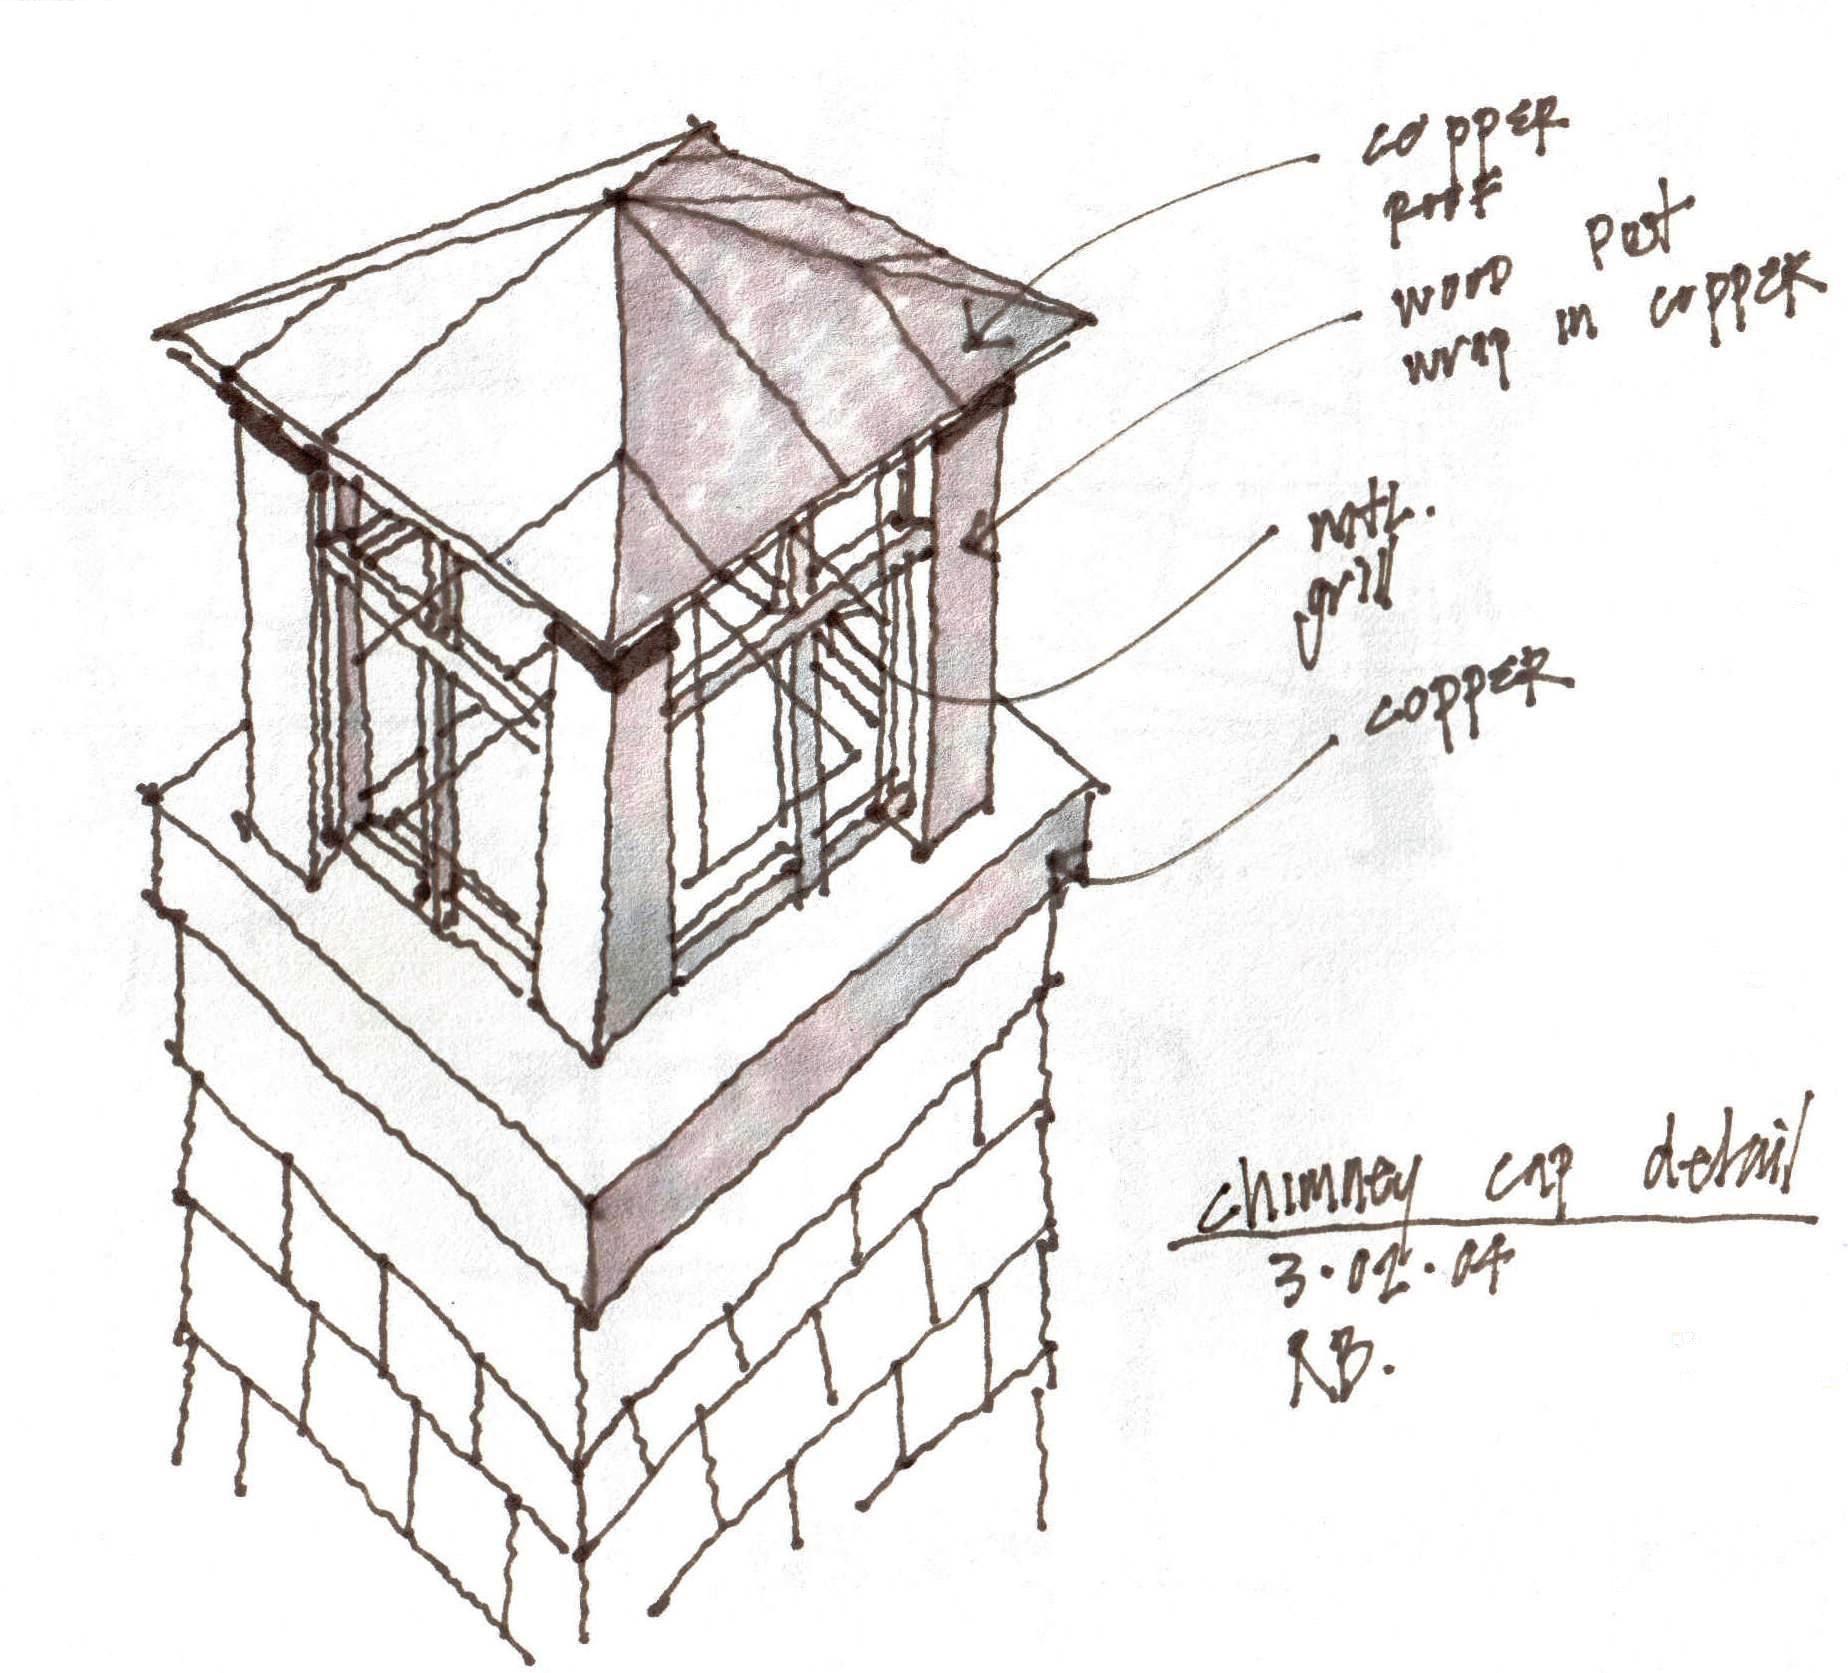 chimney01.jpg